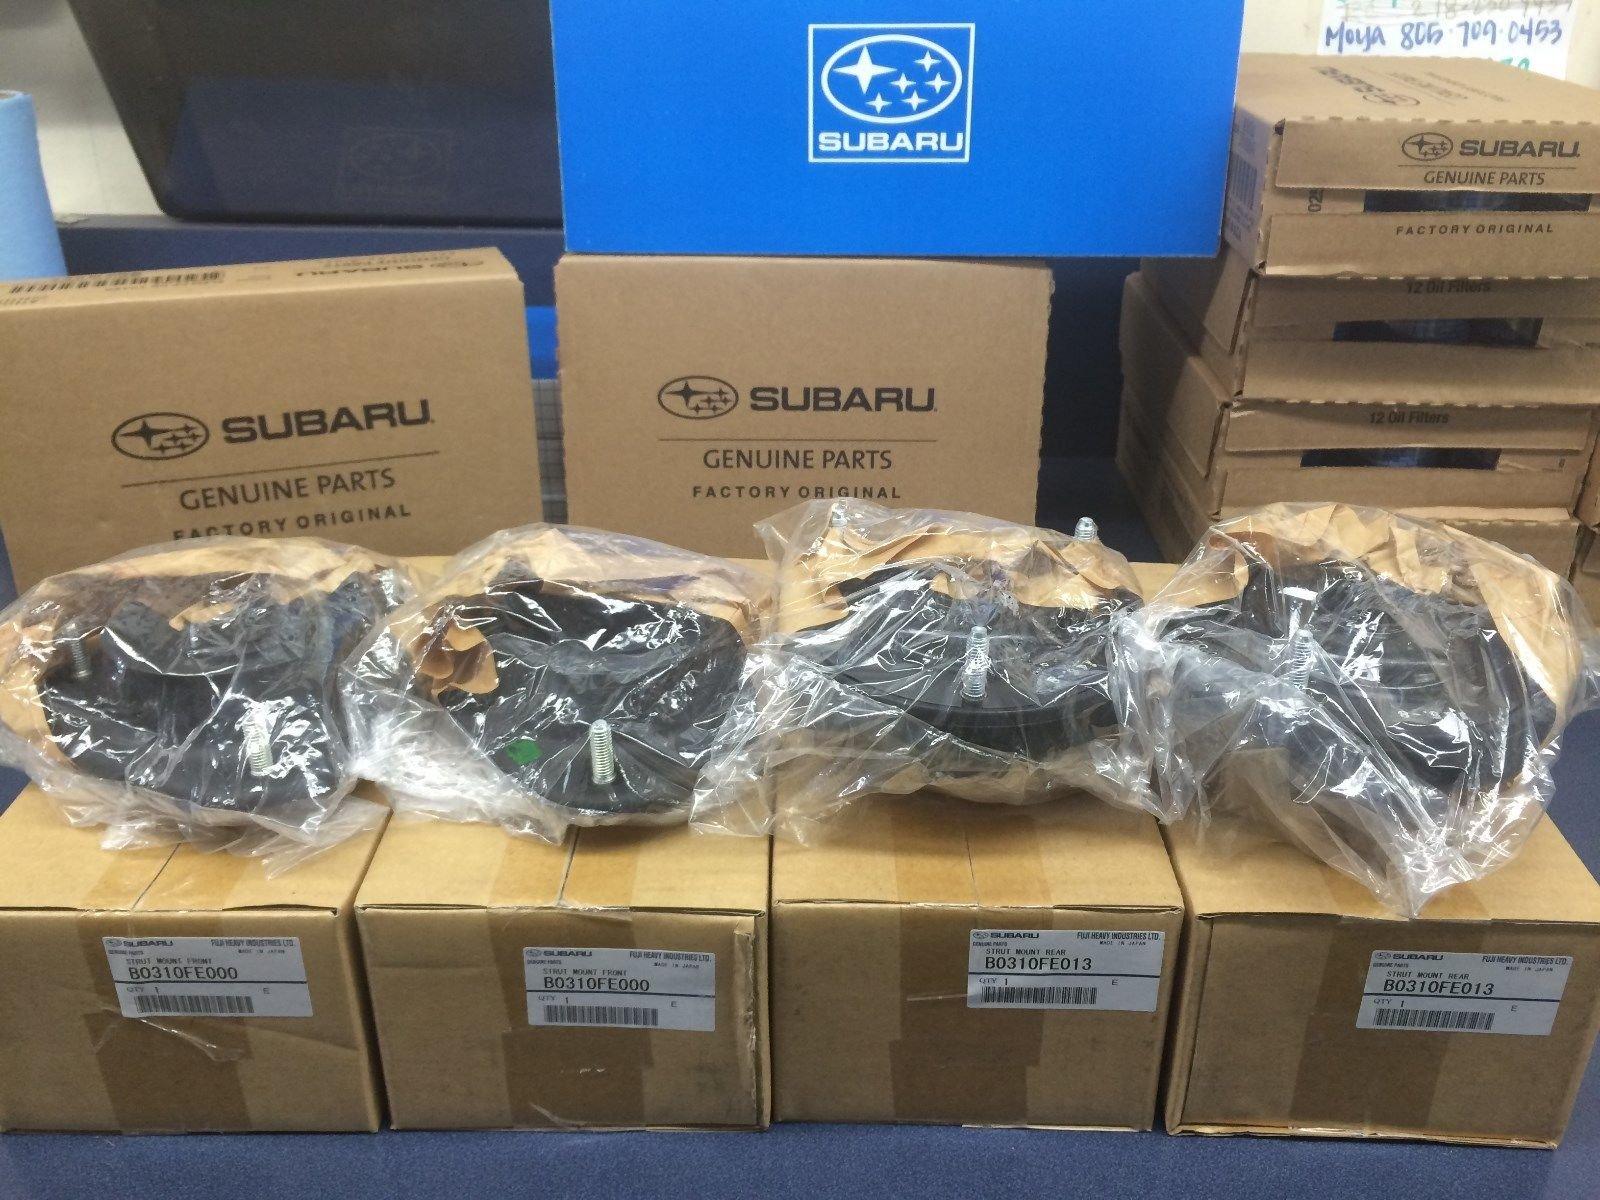 Genuine Subaru Group N Front & Rear Strut Mounts WRX Forester STi SET TURBO OEM 4 MOUNTS